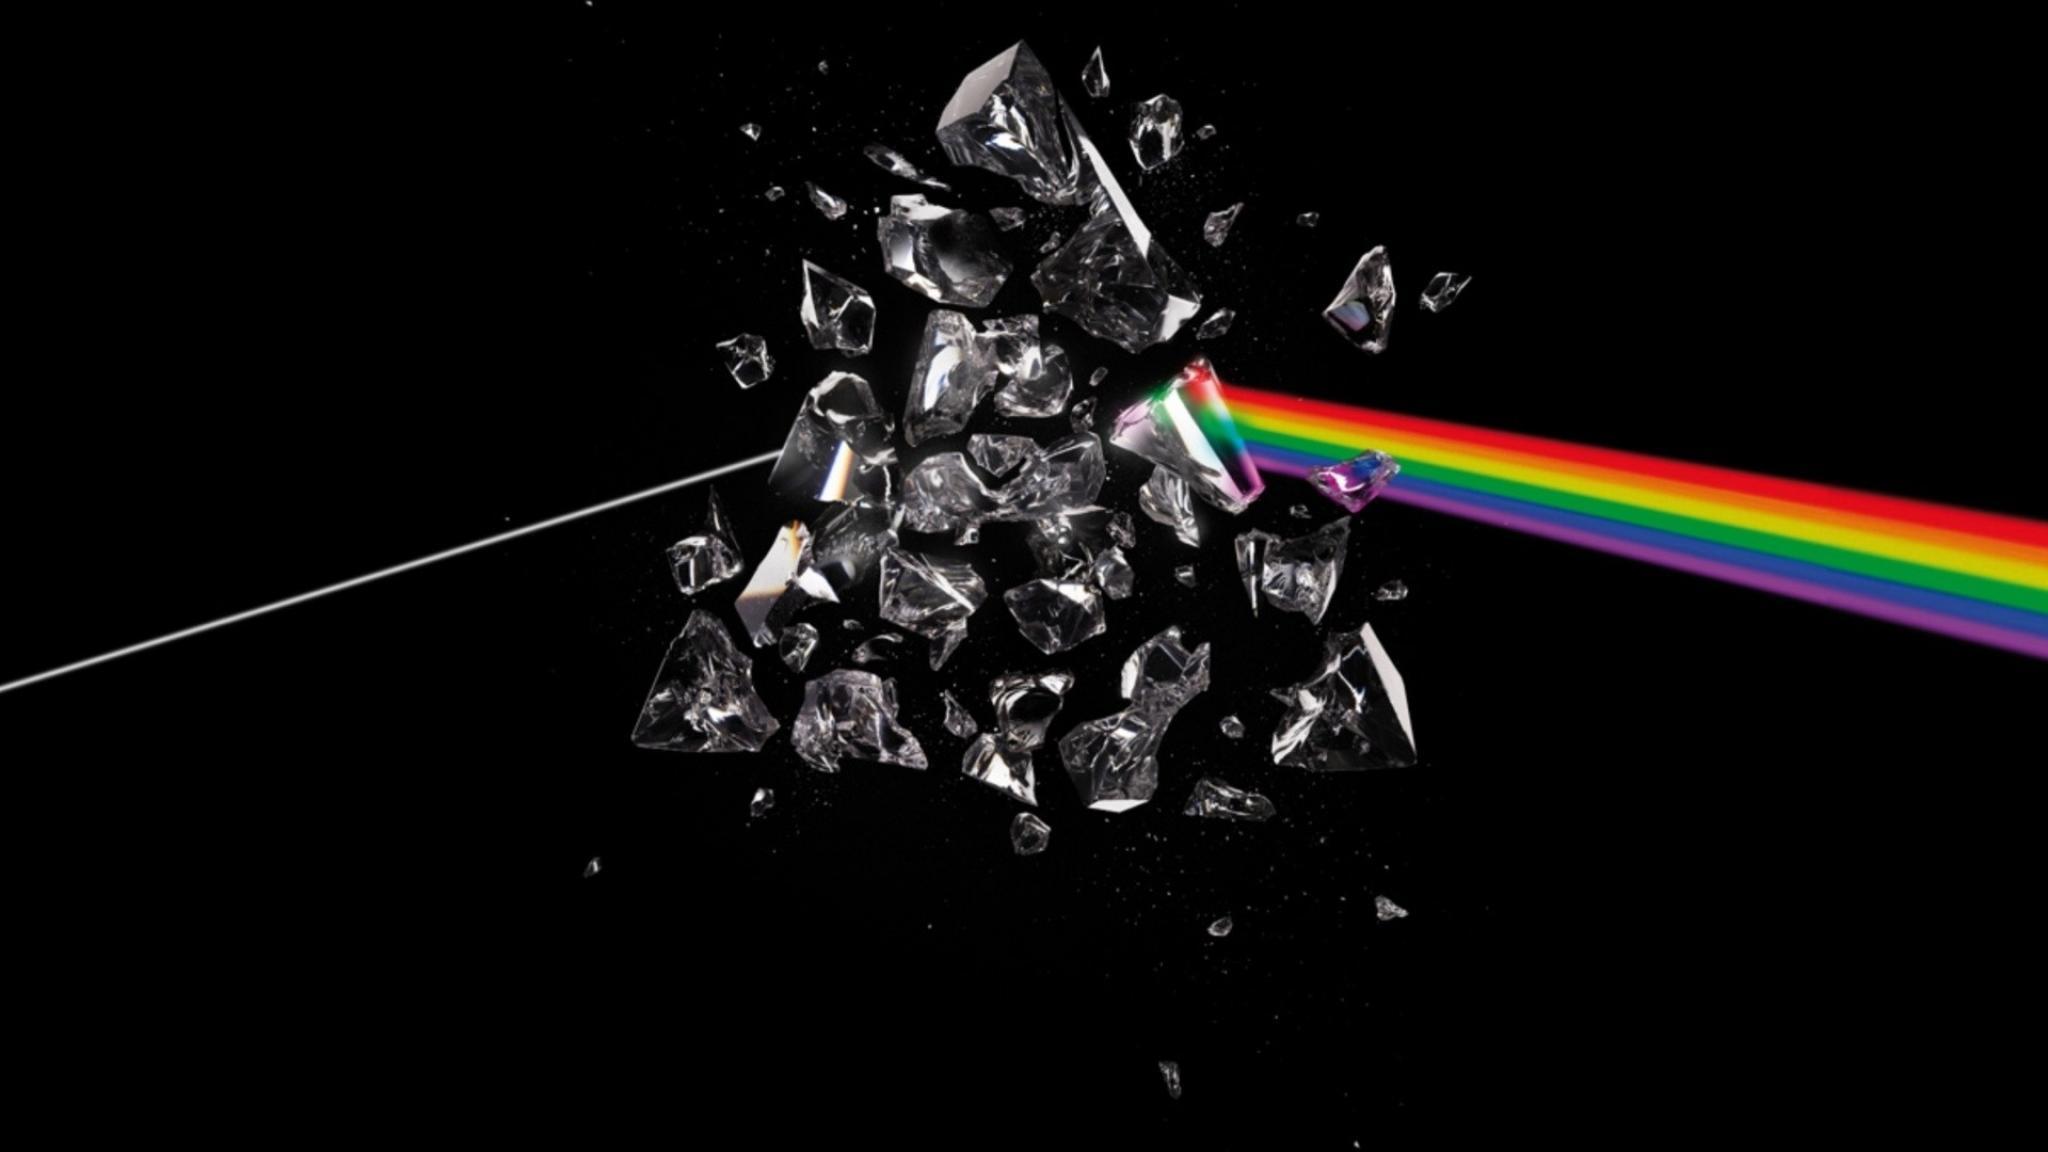 Pink Floyd Wallpapers HD 2048x1152